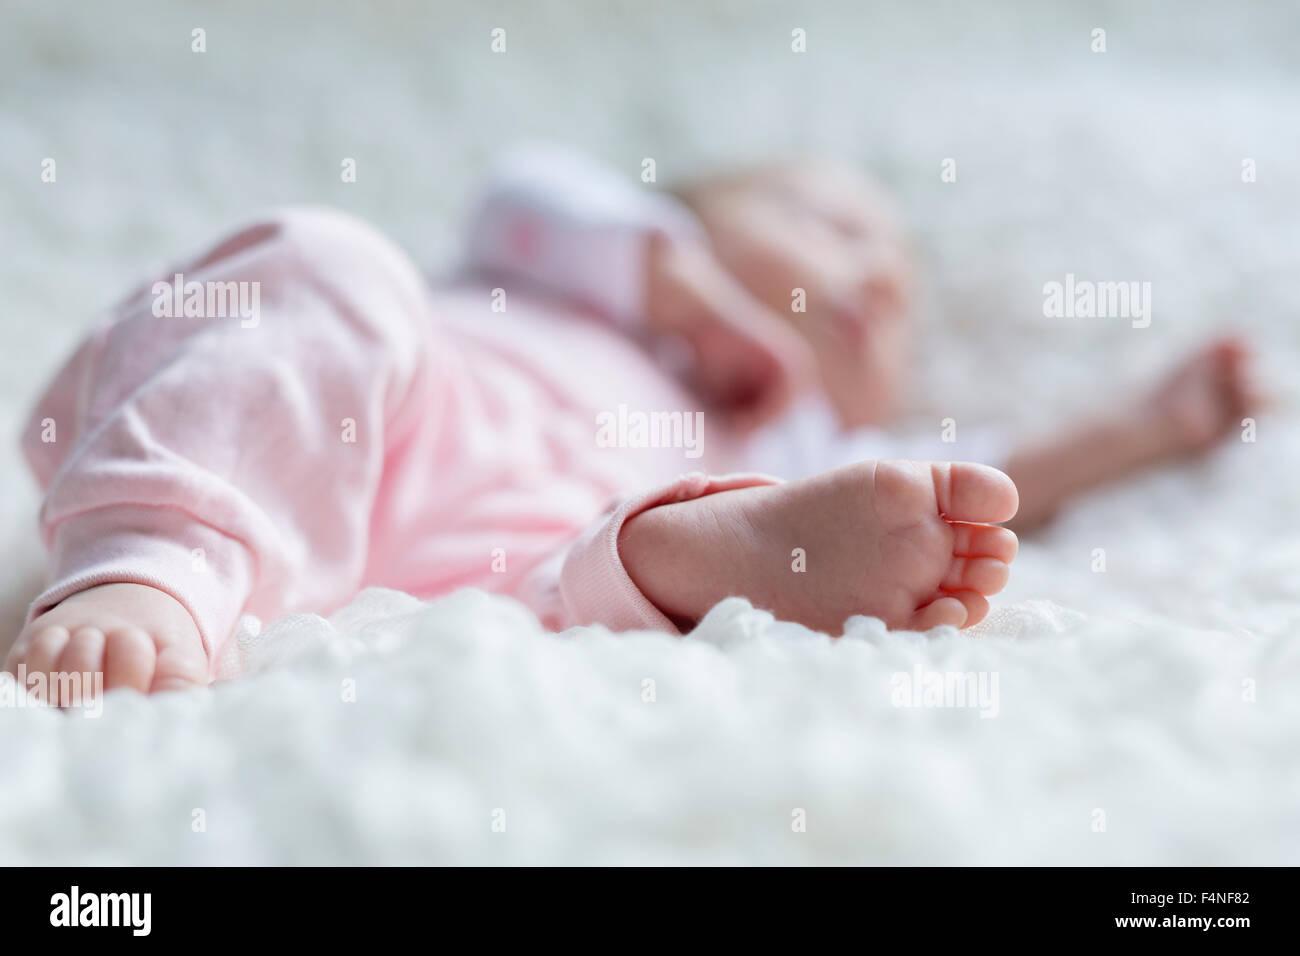 Foot of newborn baby girl - Stock Image